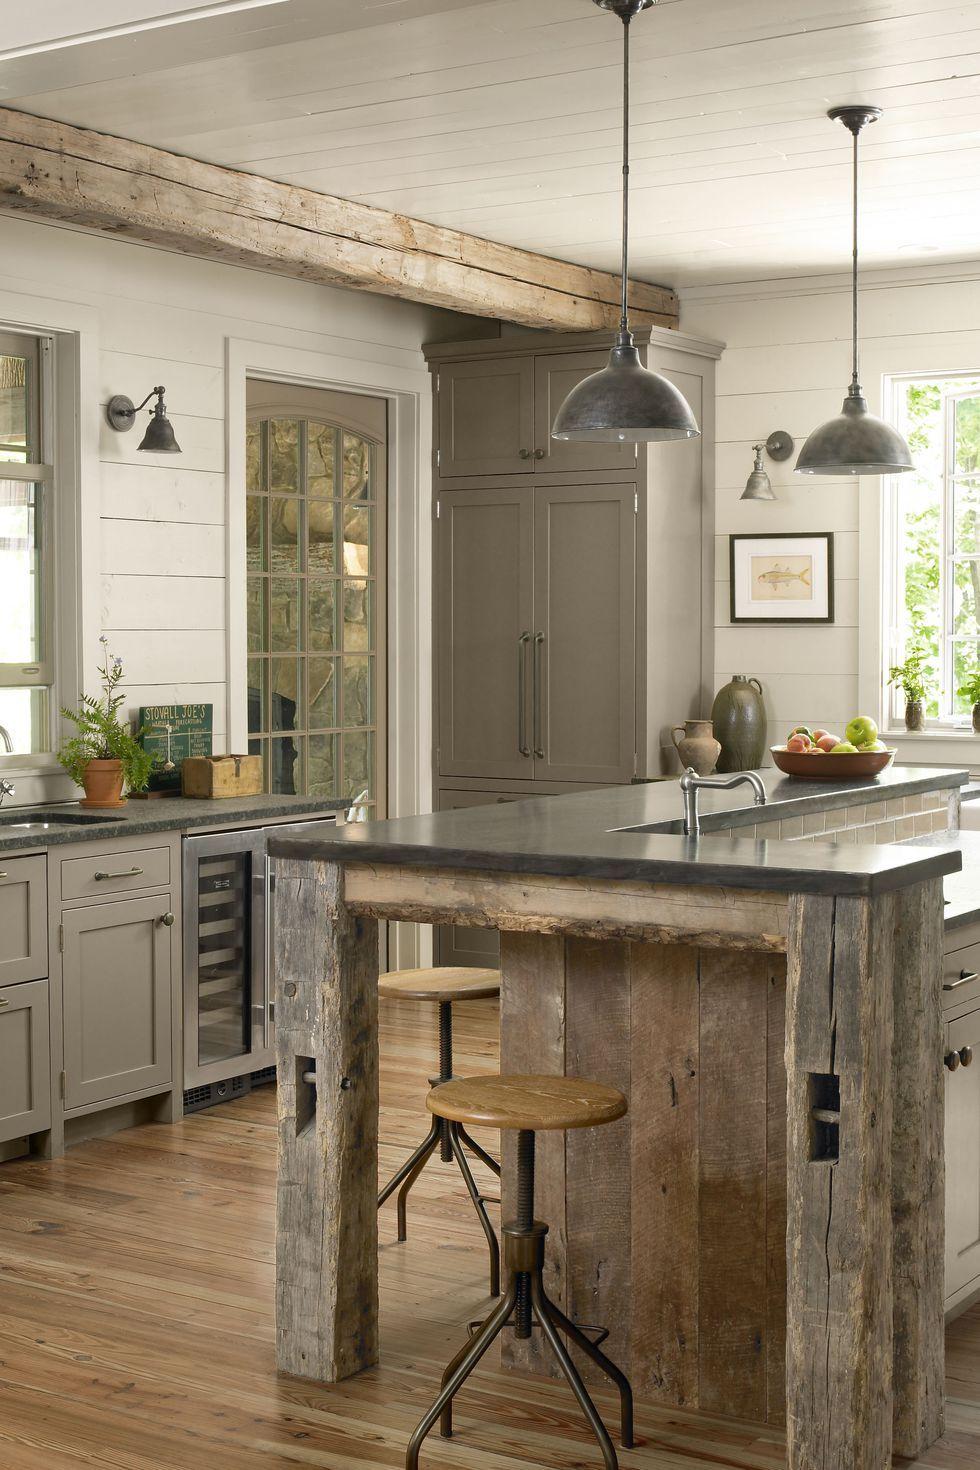 charming kitchen island ideas that are both stylish and storage friendly farmhouse kitchen on e kitchen ideas id=41862